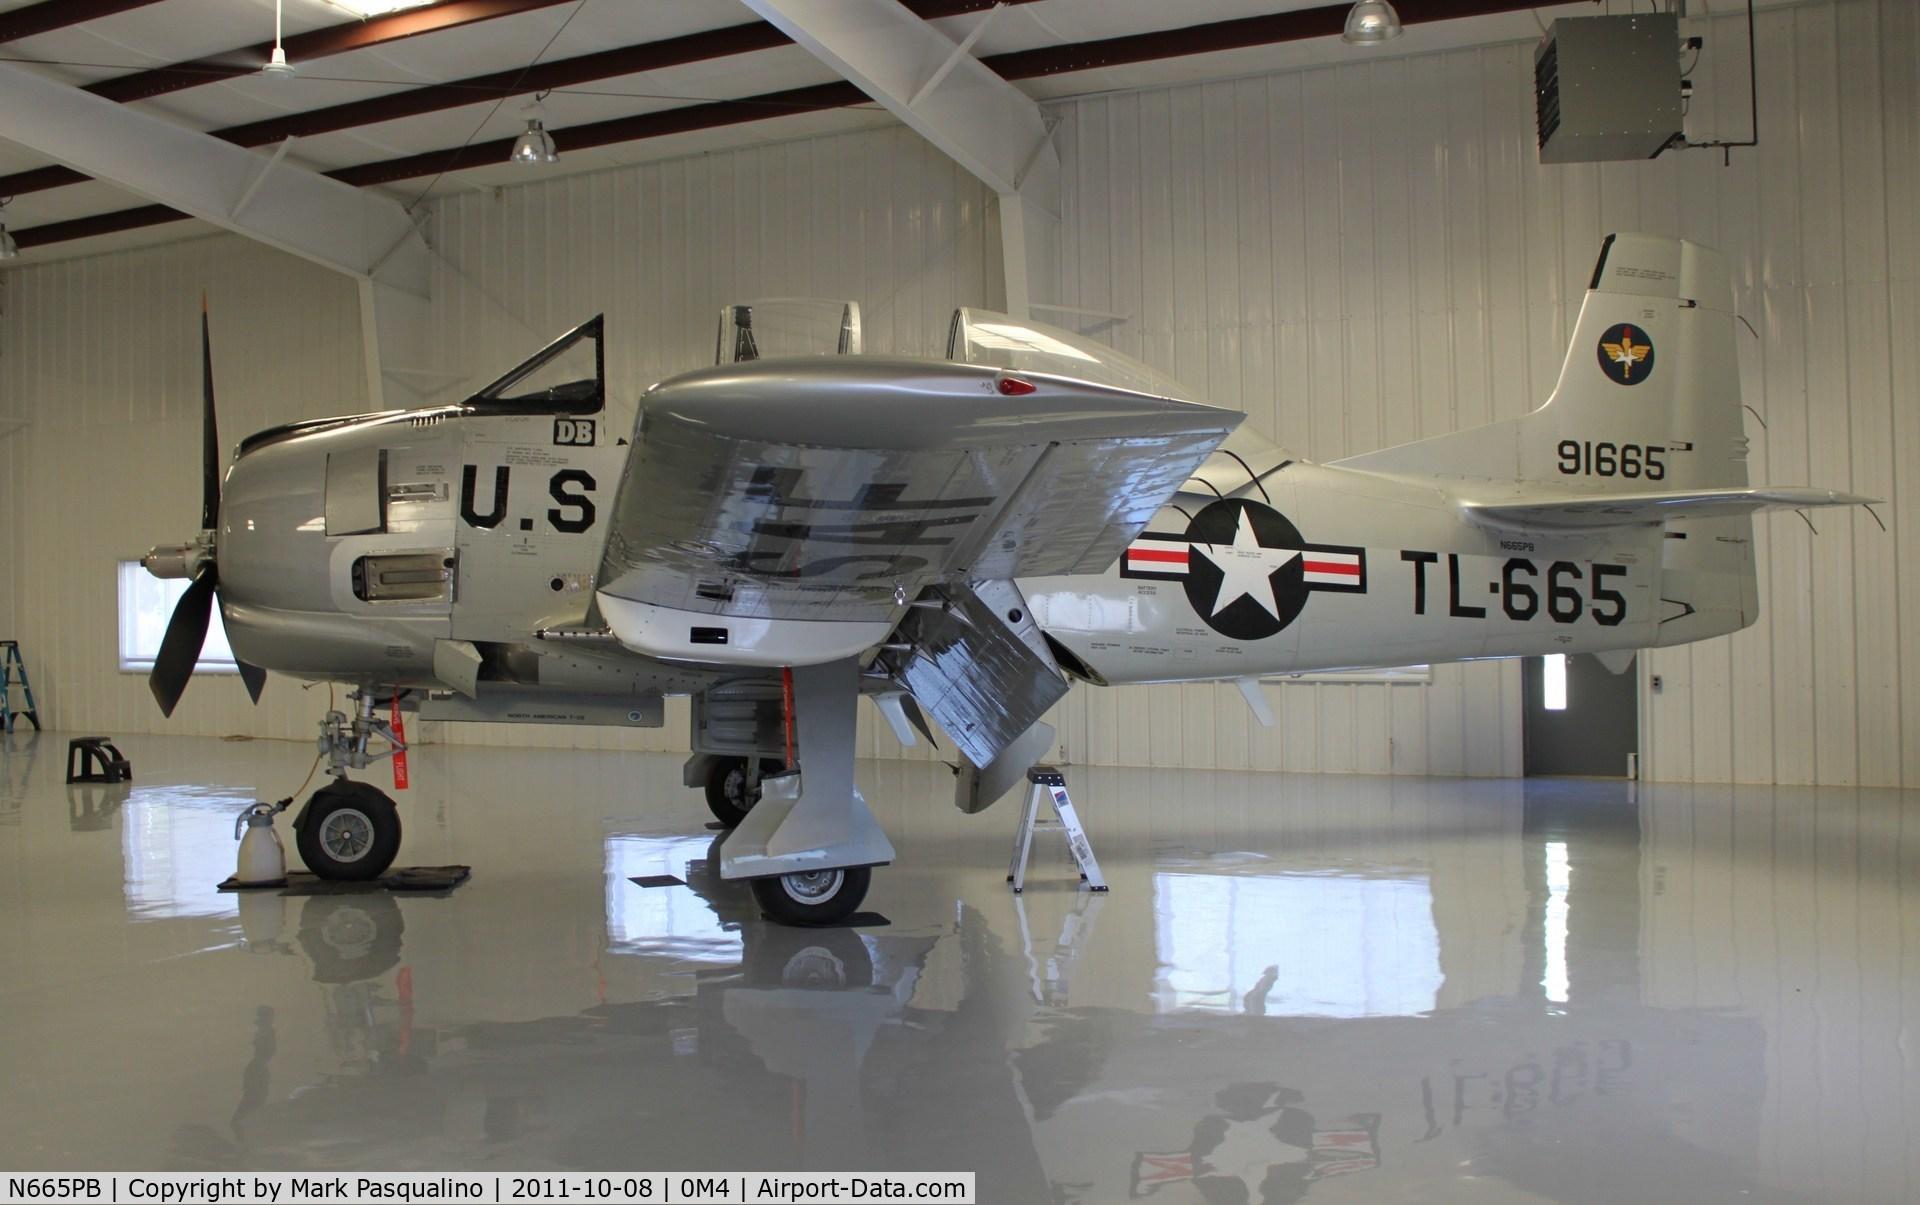 N665PB, 1949 North American T-28A Trojan C/N 159-177, North American T-28A